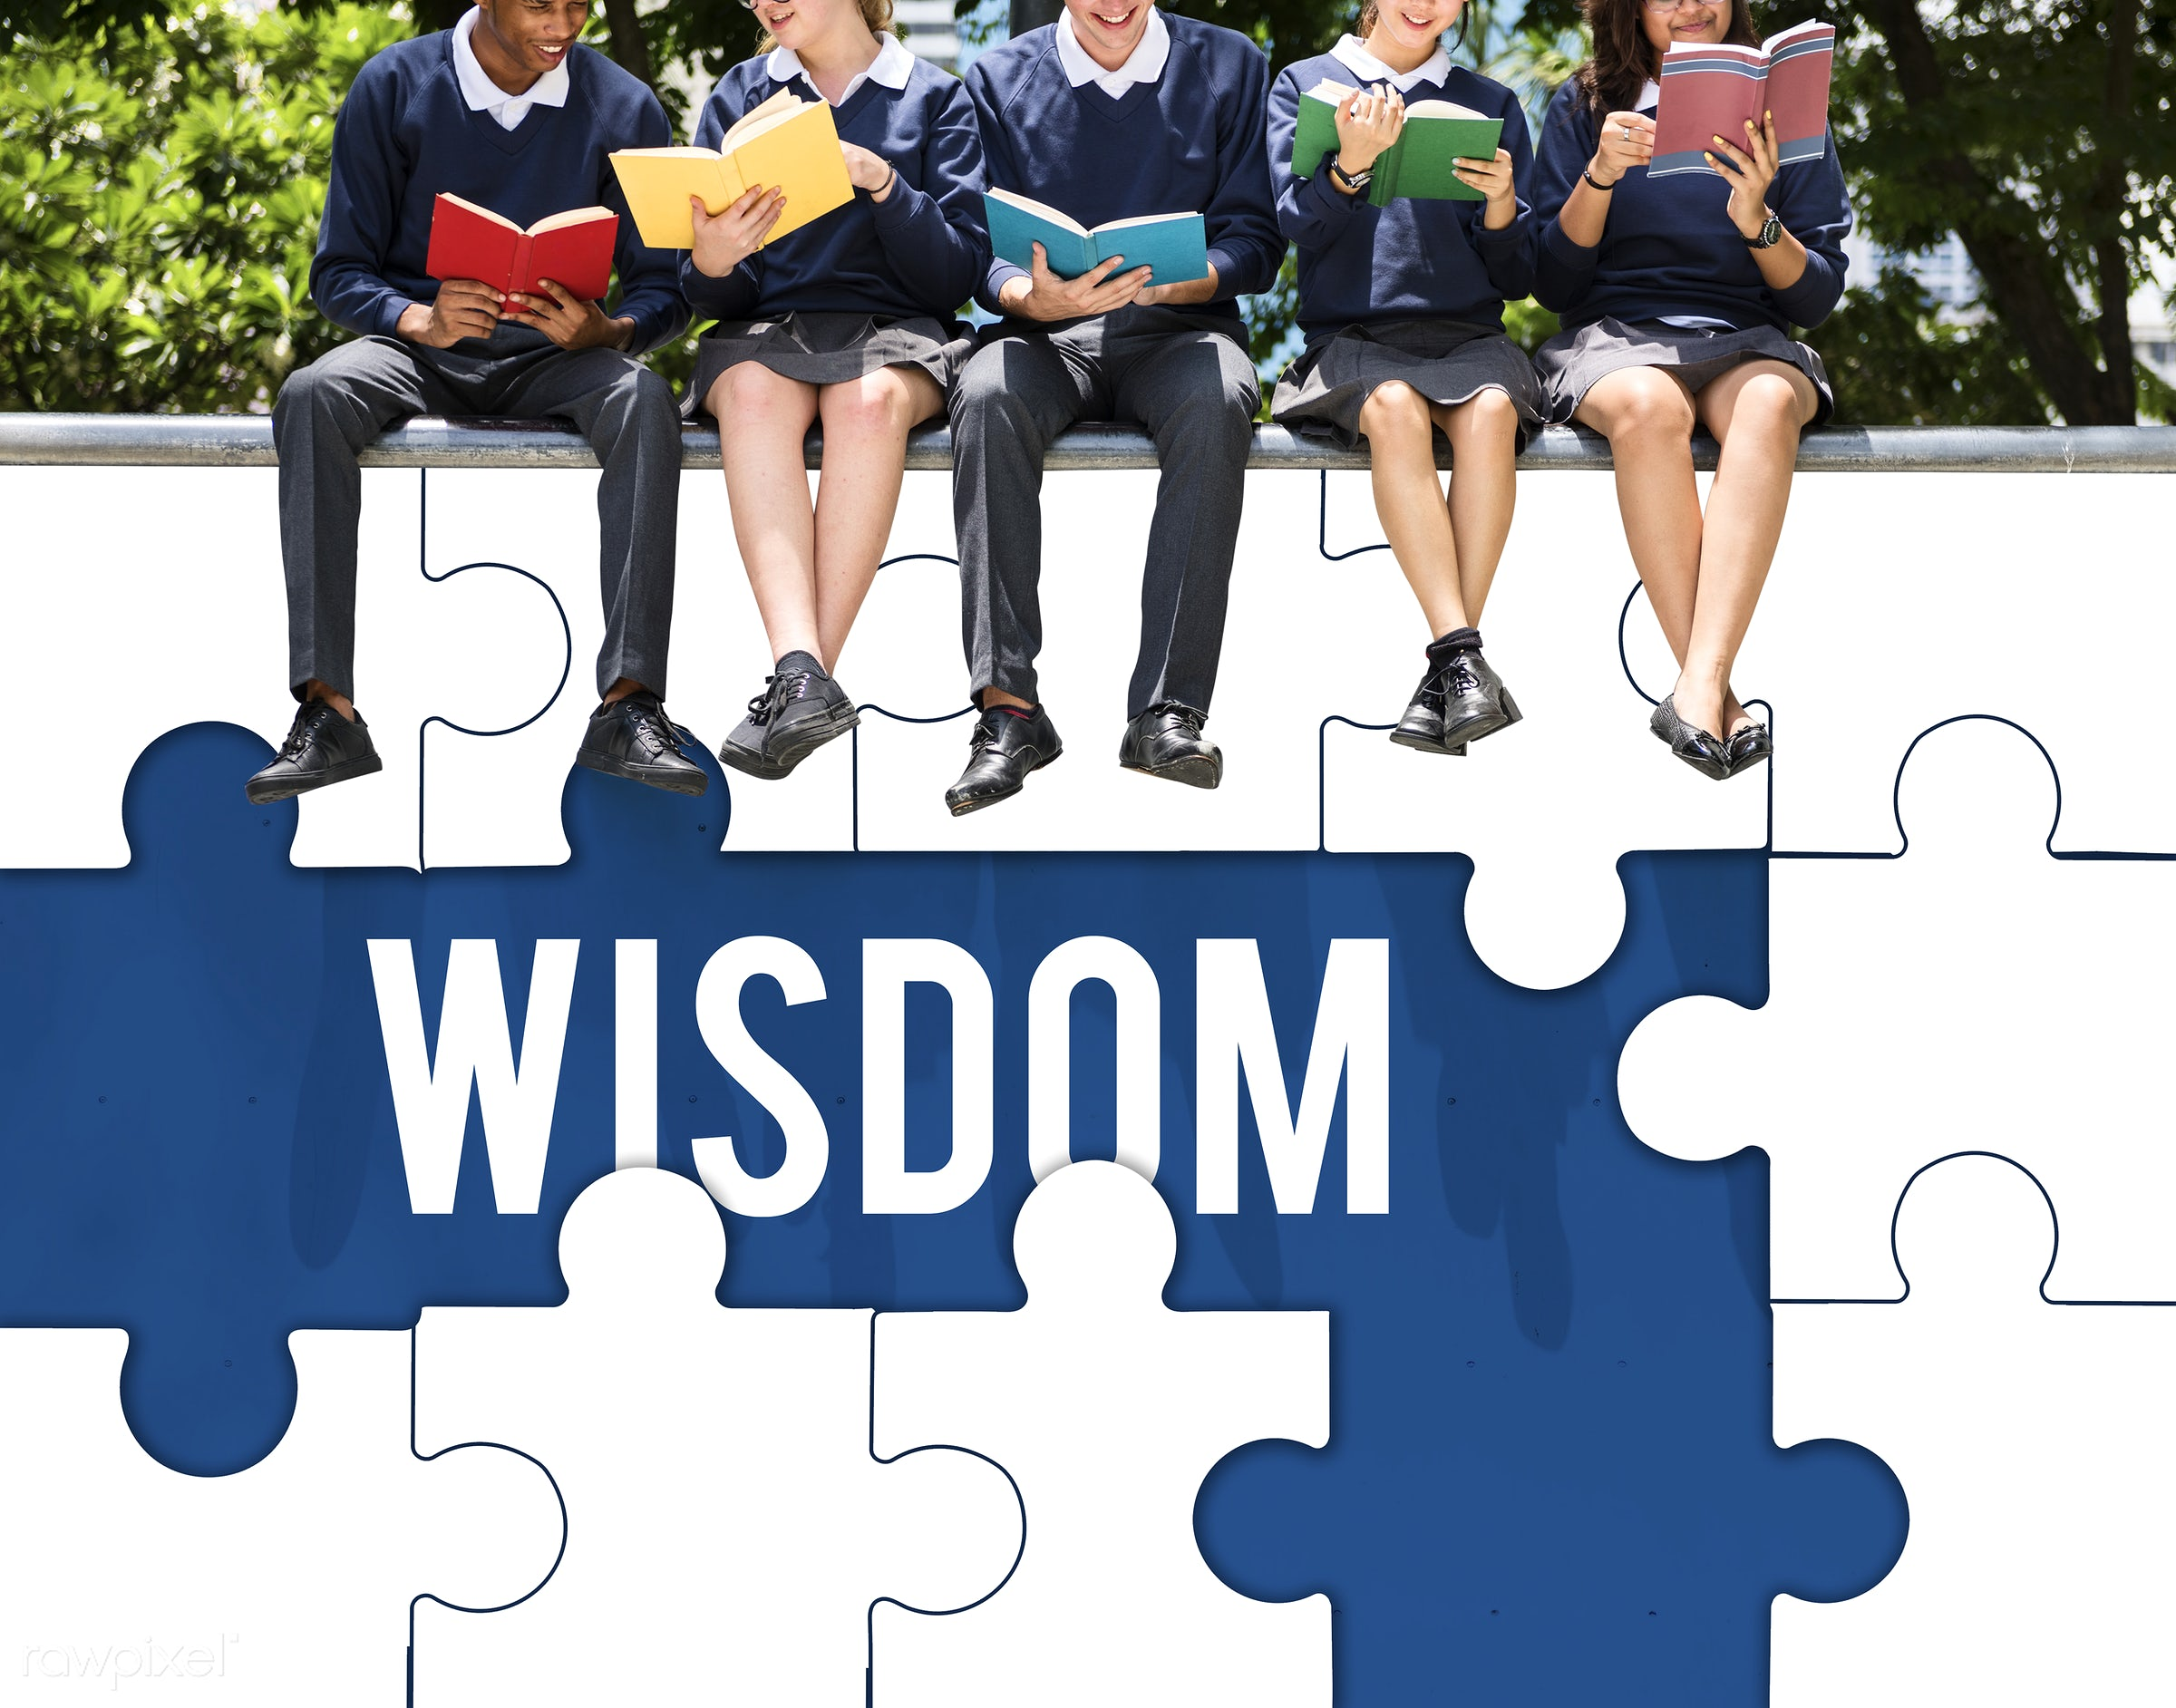 academics, academy, books, certification, class, college, curriculum, diversity, e-learning, friends, friendship, game, high...